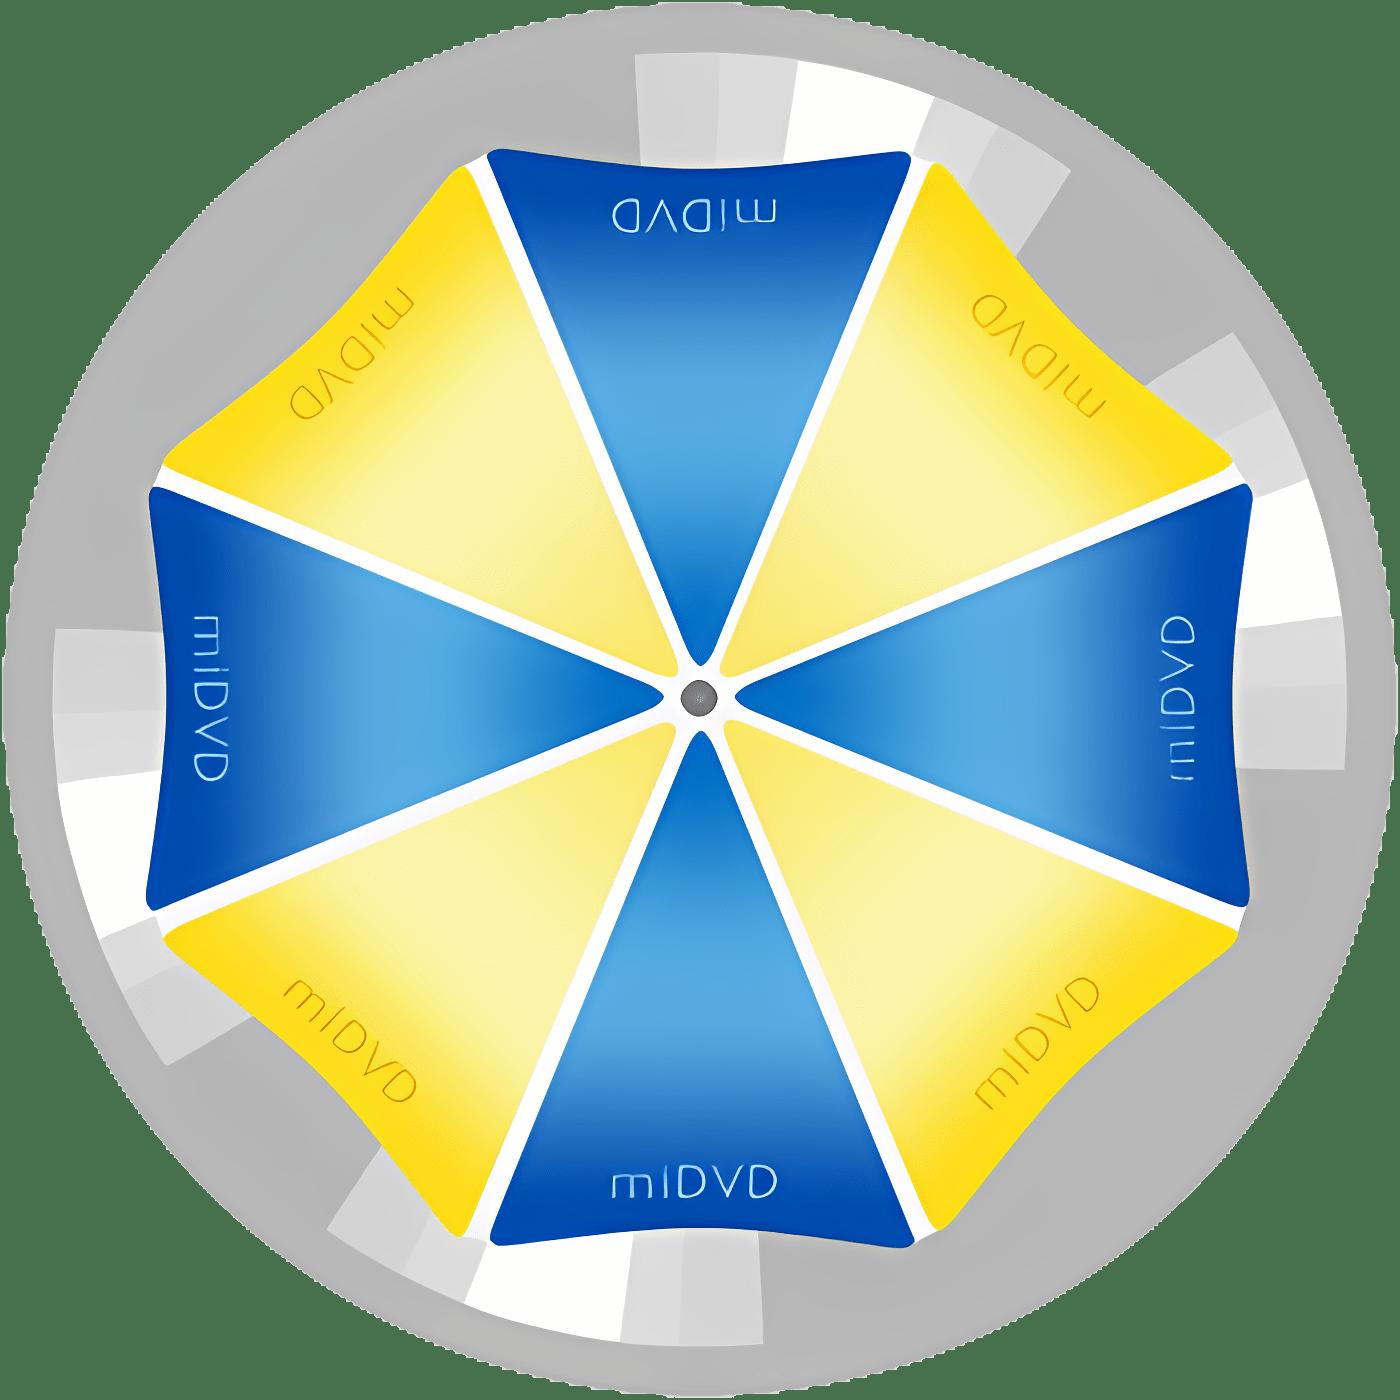 miDVD 1.1.6